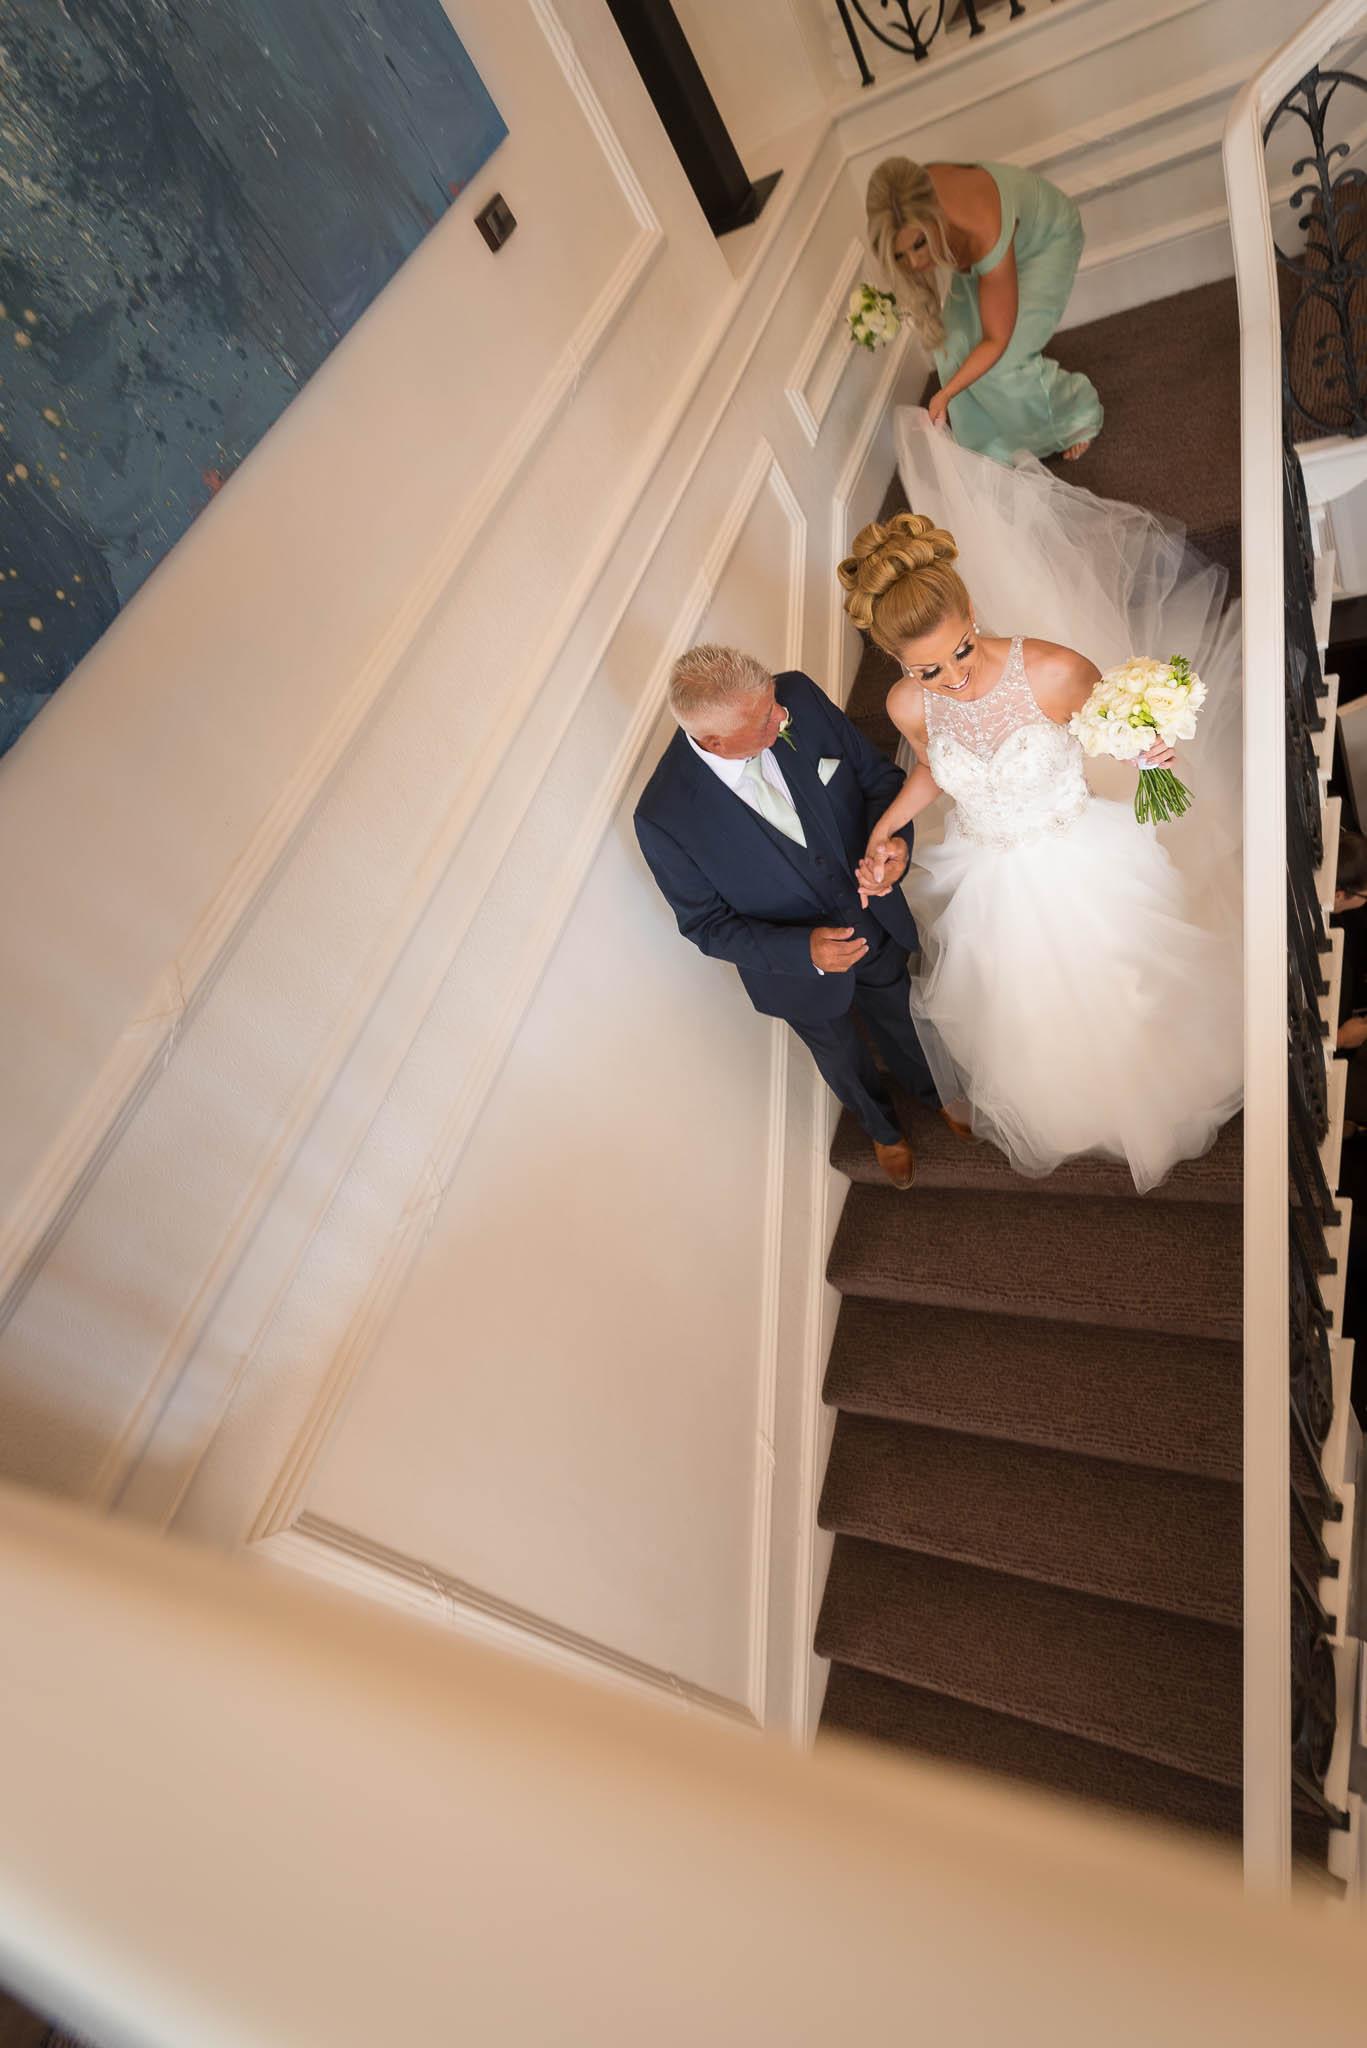 Lee Gemma Aston Hall Wedding Photographer-41.jpg